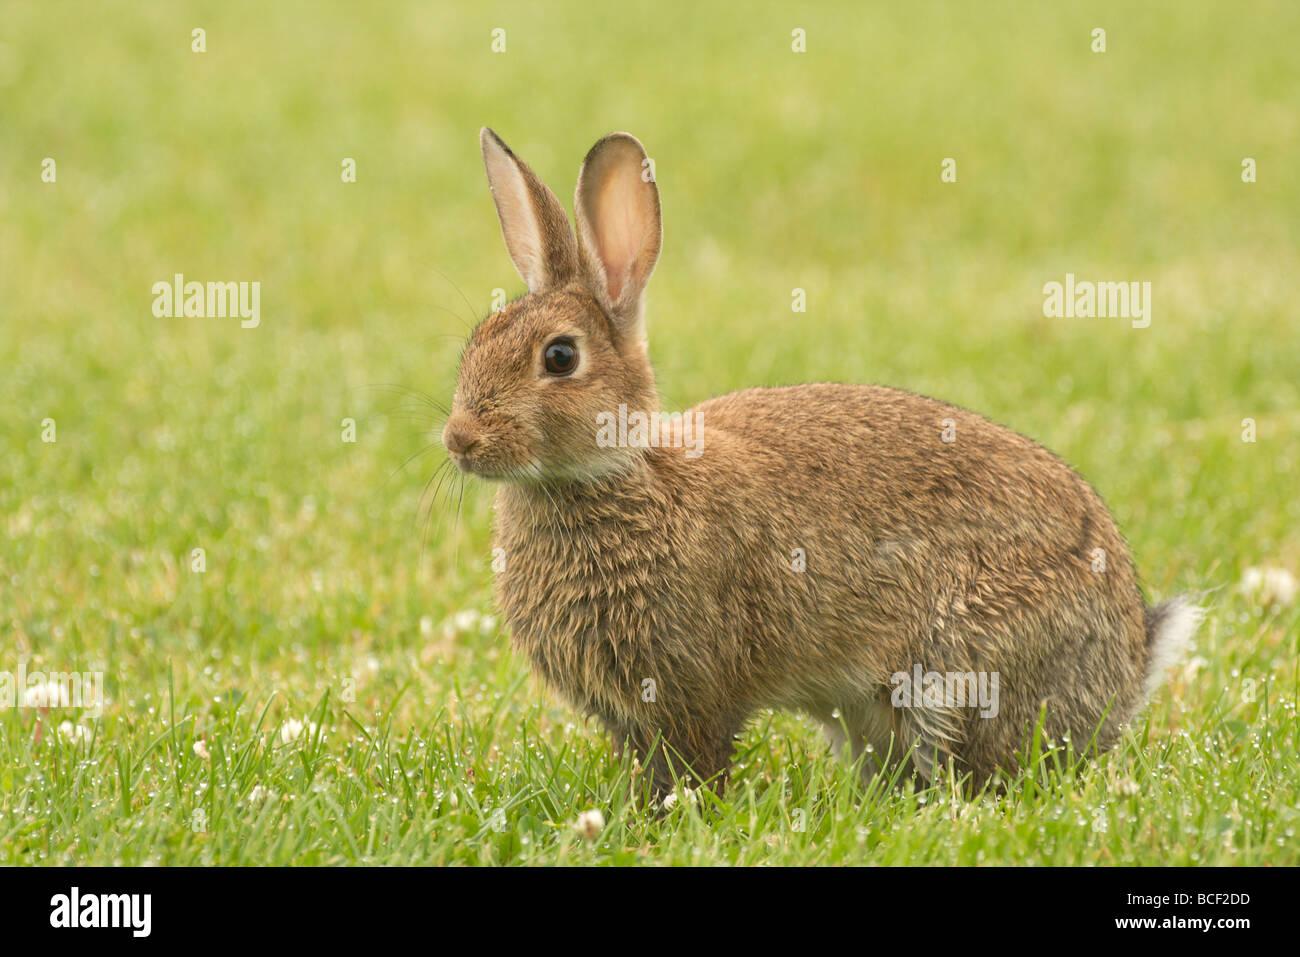 a young alert rabbit - Stock Image